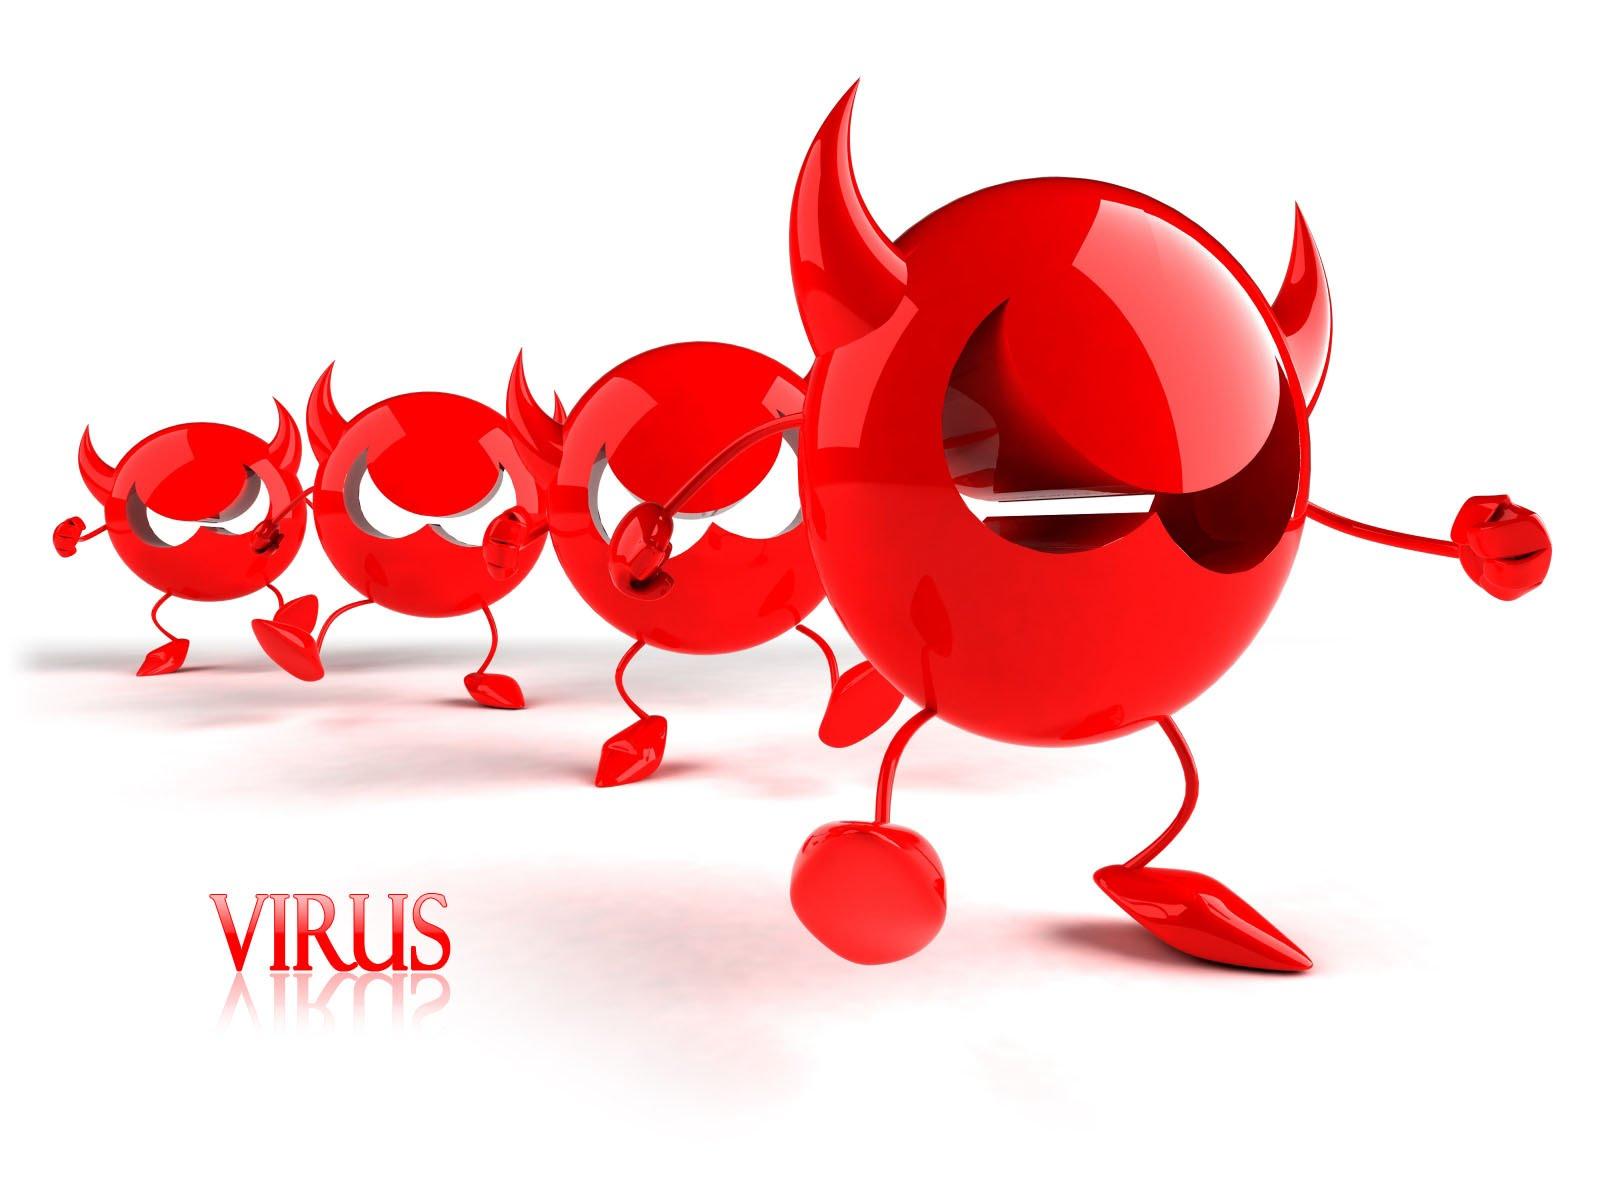 Adware.FunRebates